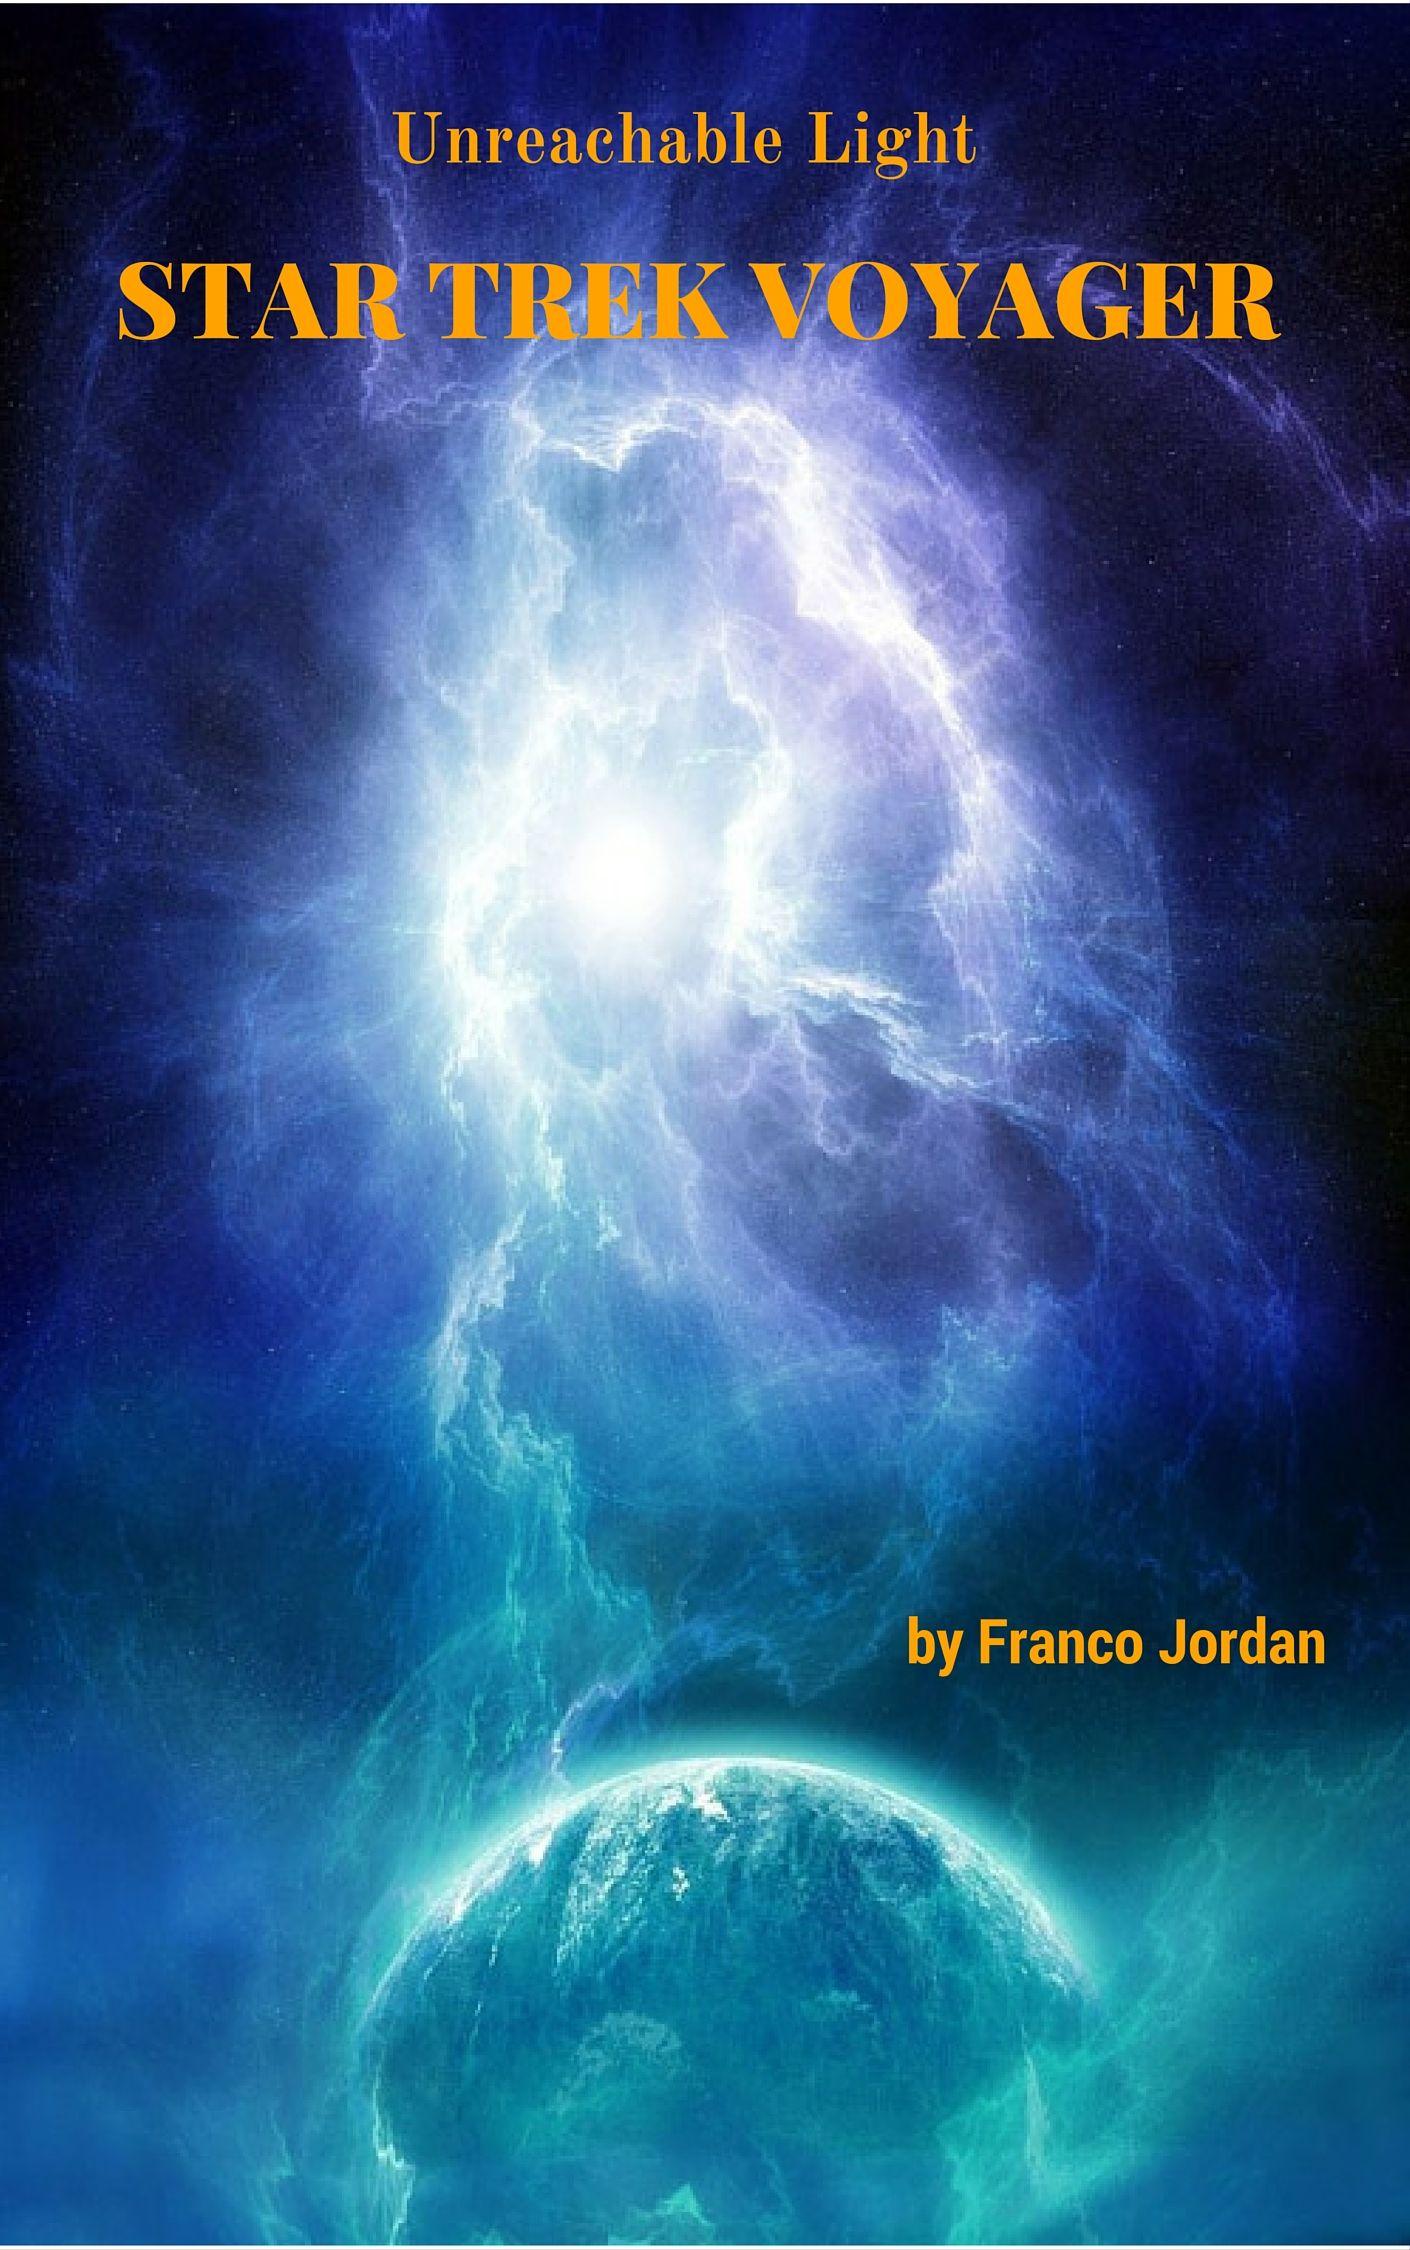 Pin By Franco Jordan On Star Trek Voyager Unreachable Light